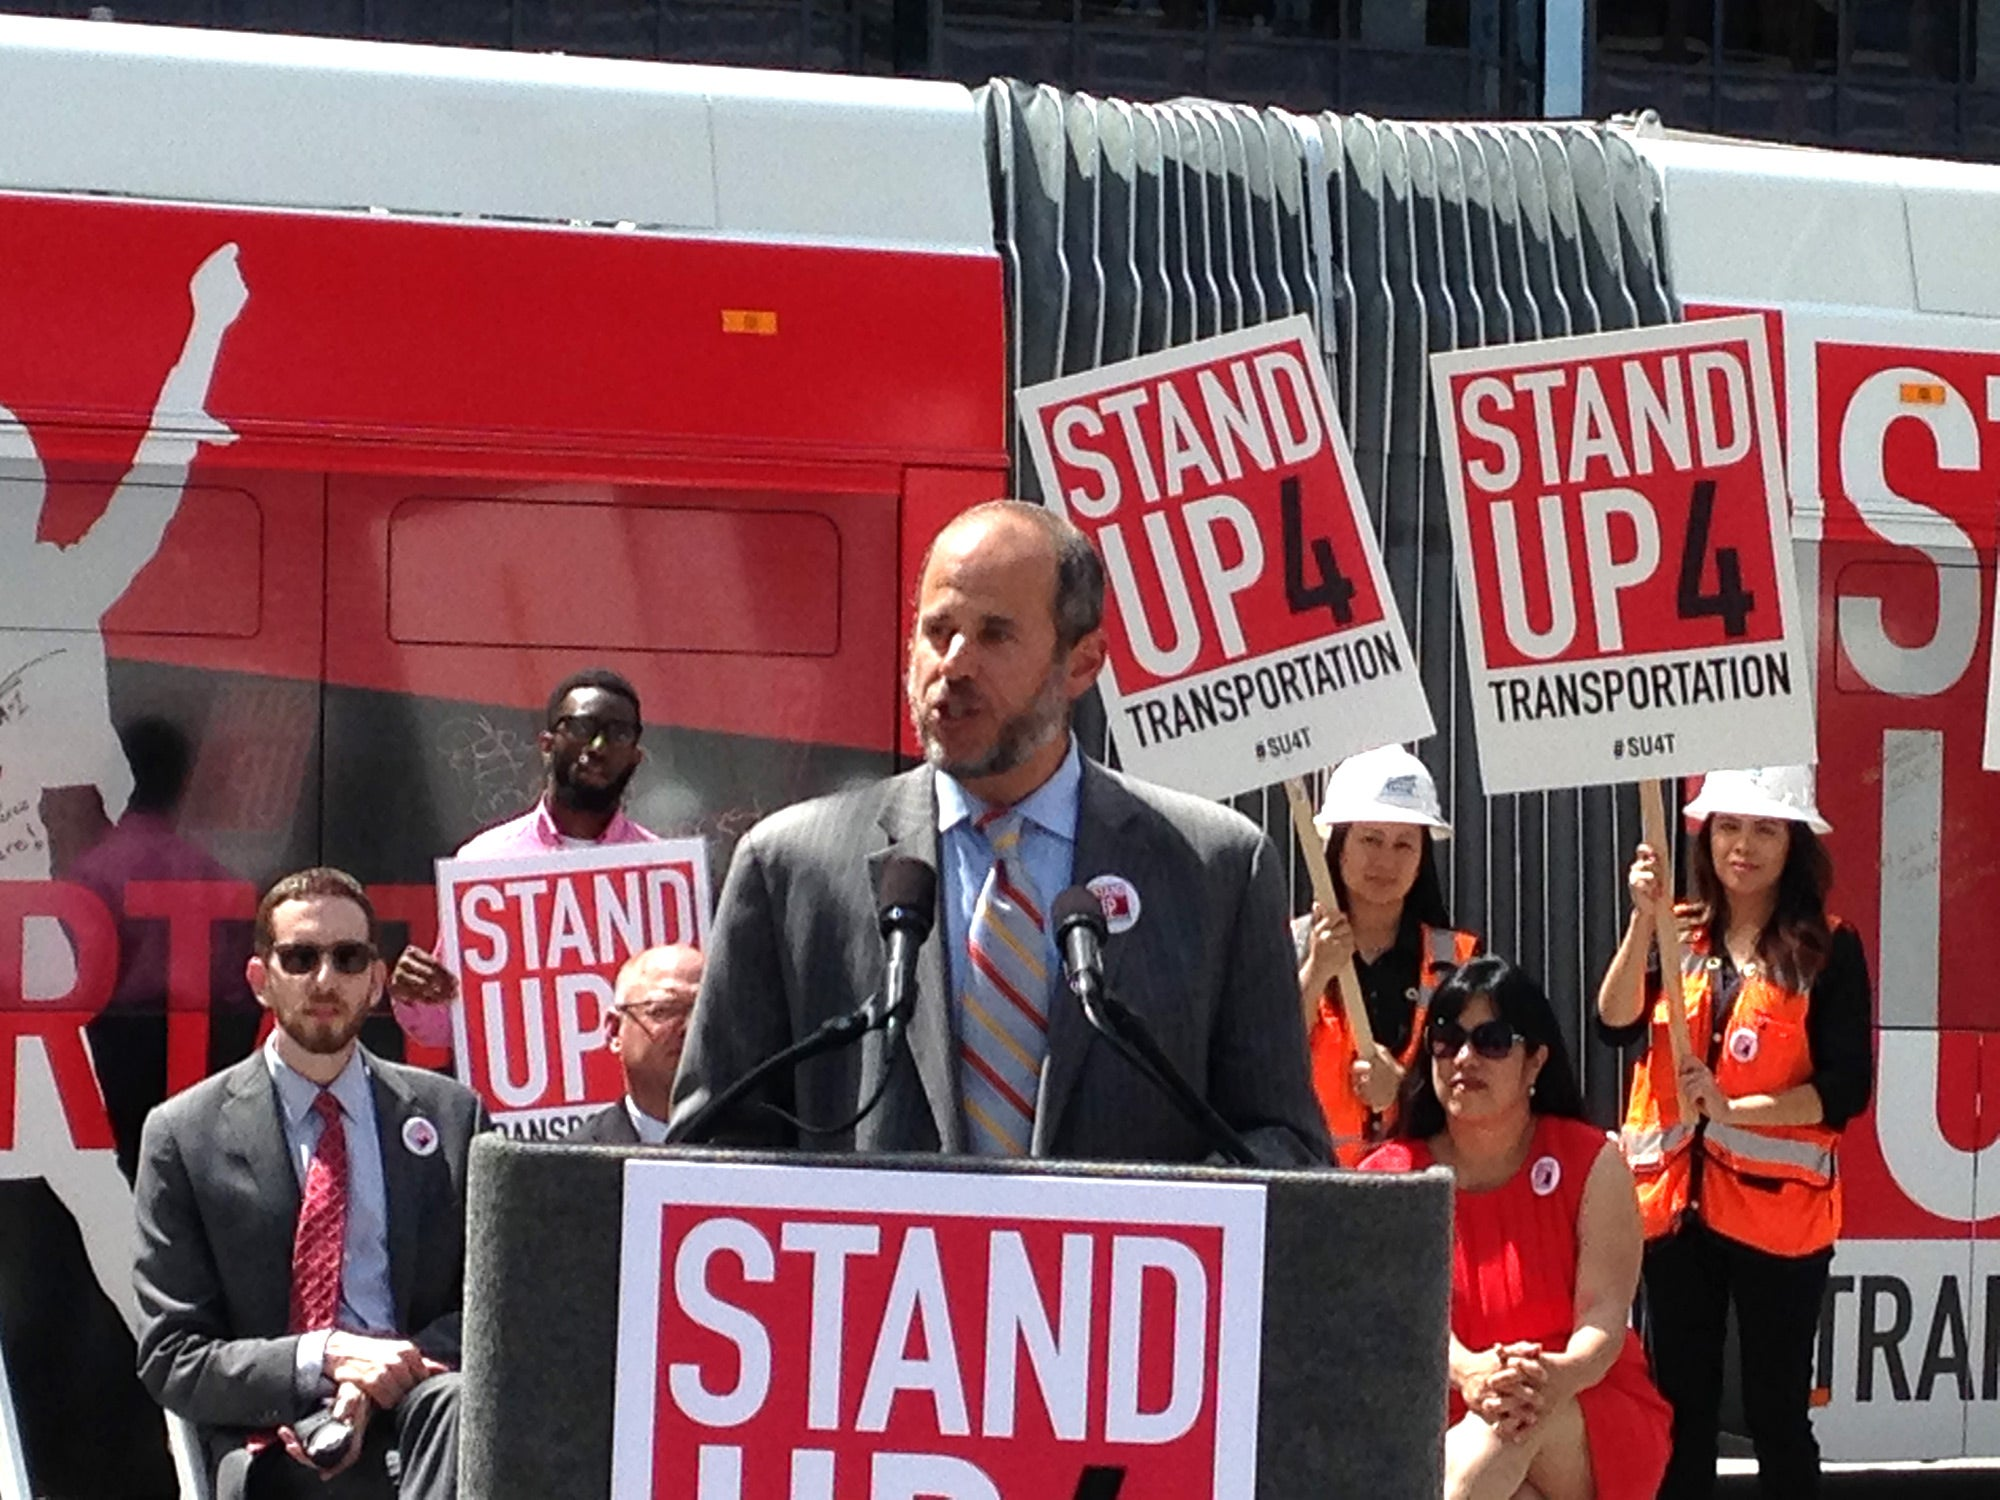 Ed Resikin, director of transportation for the San Francisco Municipal Transportation Agency